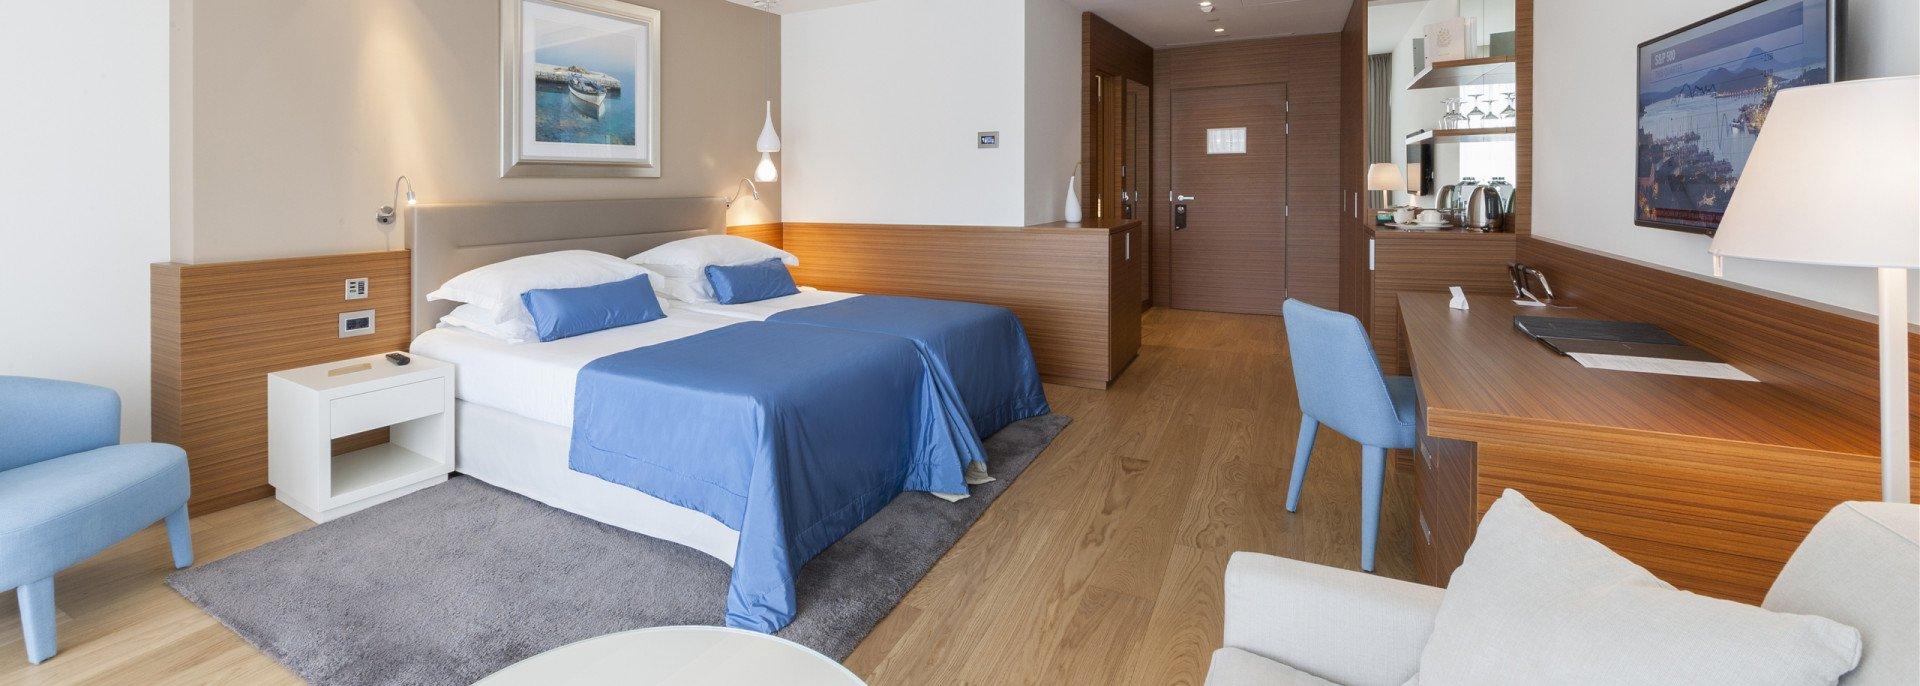 https://www.losinj-hotels.com/assets/Bellevue/Rooms-Suites/_resampled/CroppedFocusedImageWyIxOTIwIiwiNjg2IiwieSIsMzQ1XQ/deluxe-1.jpg